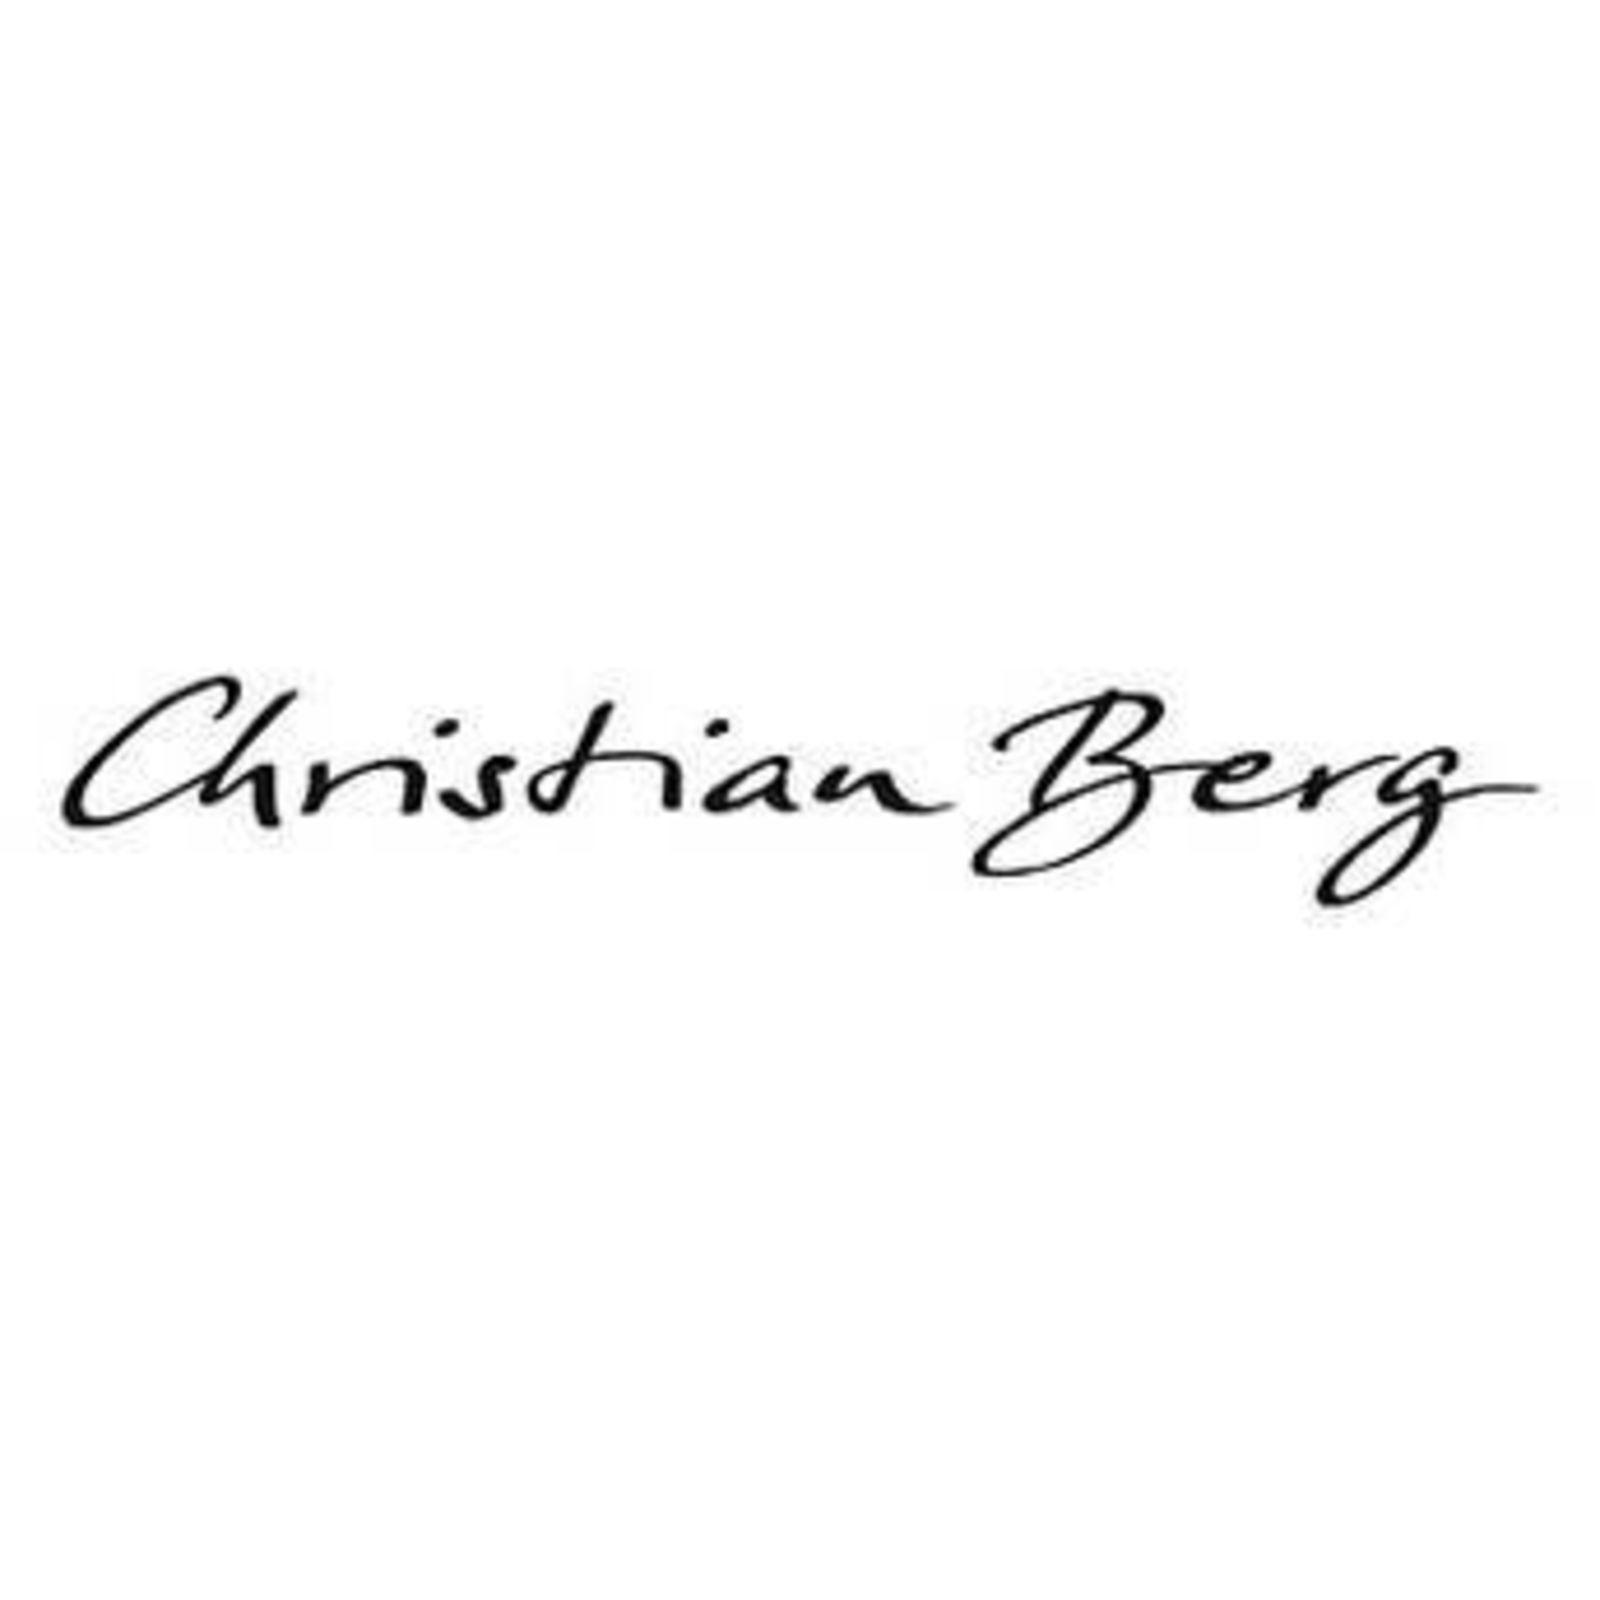 Christian Berg (Bild 1)